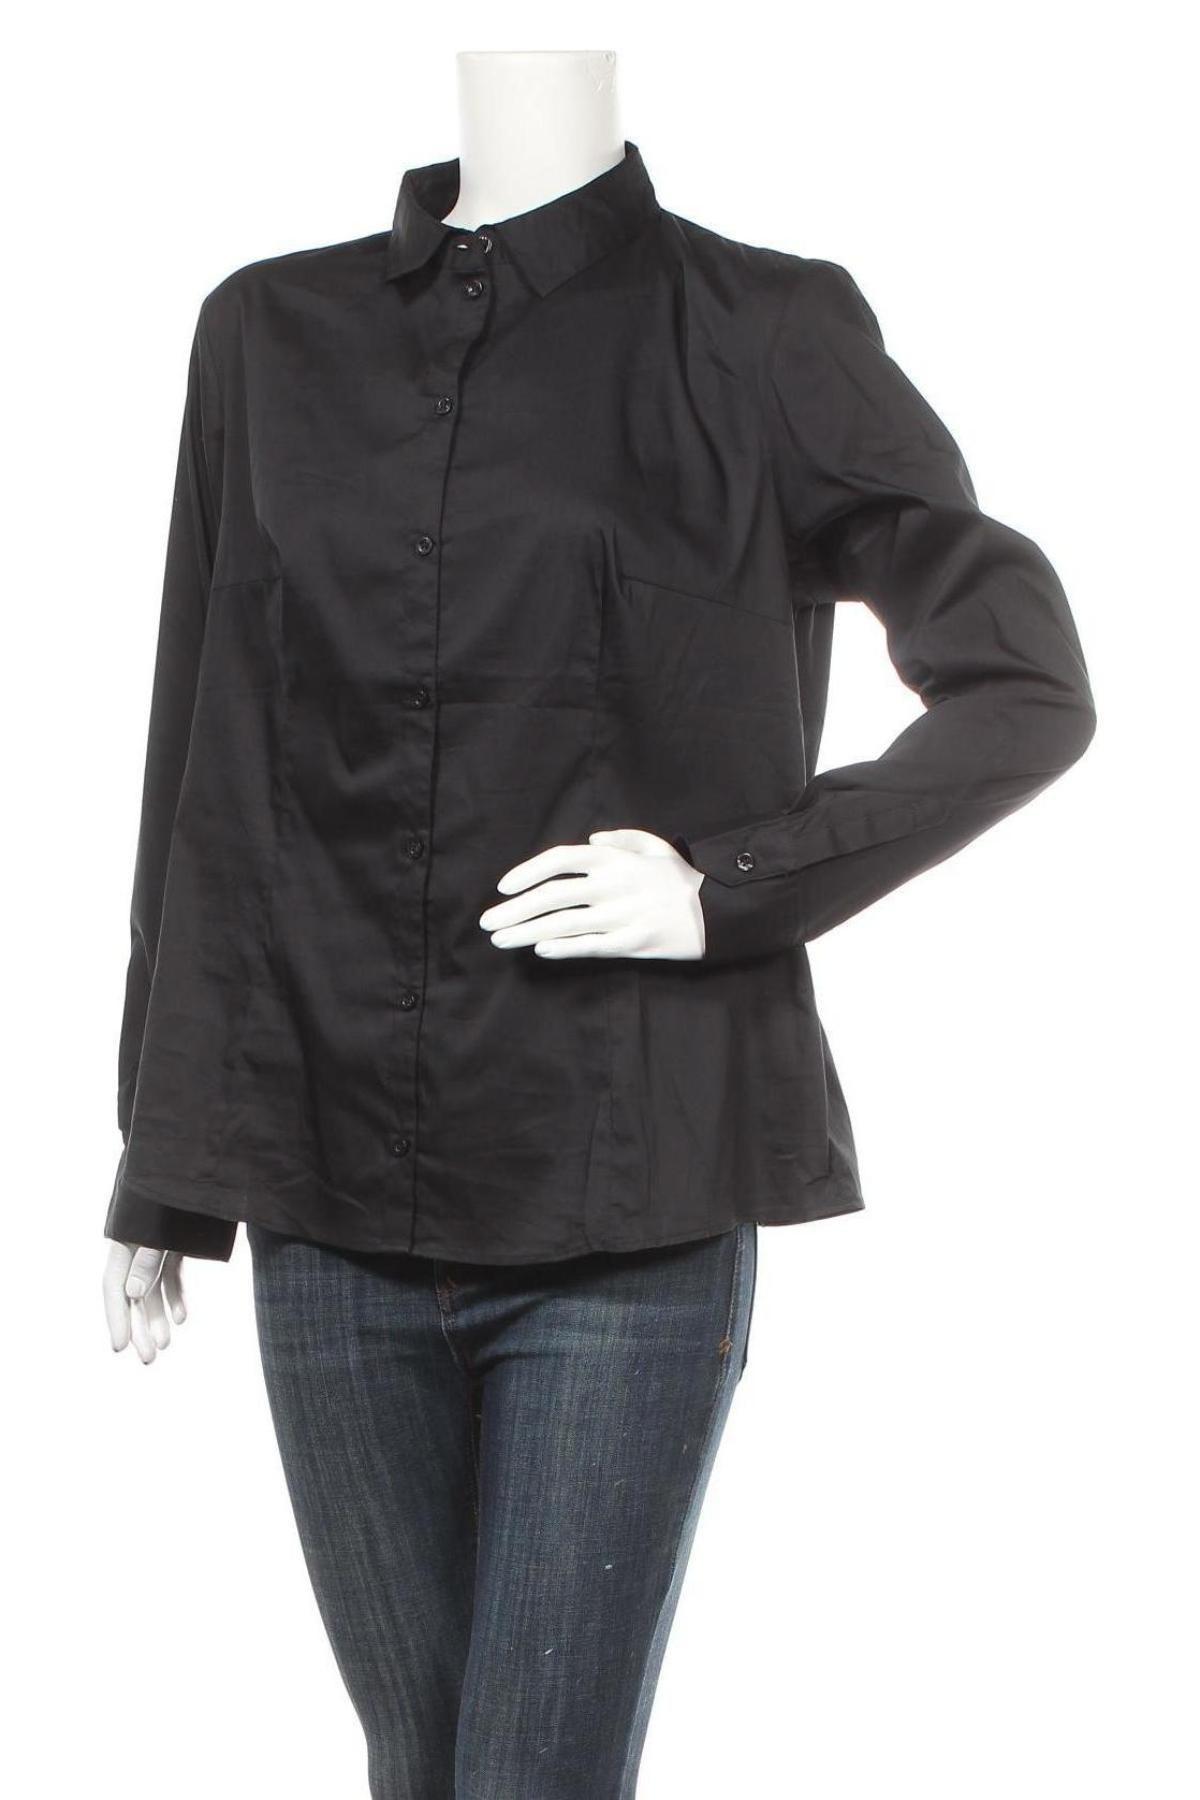 Дамска риза Montego, Размер XL, Цвят Черен, 73% памук, 23% полиестер, 4% еластан, Цена 54,00лв.